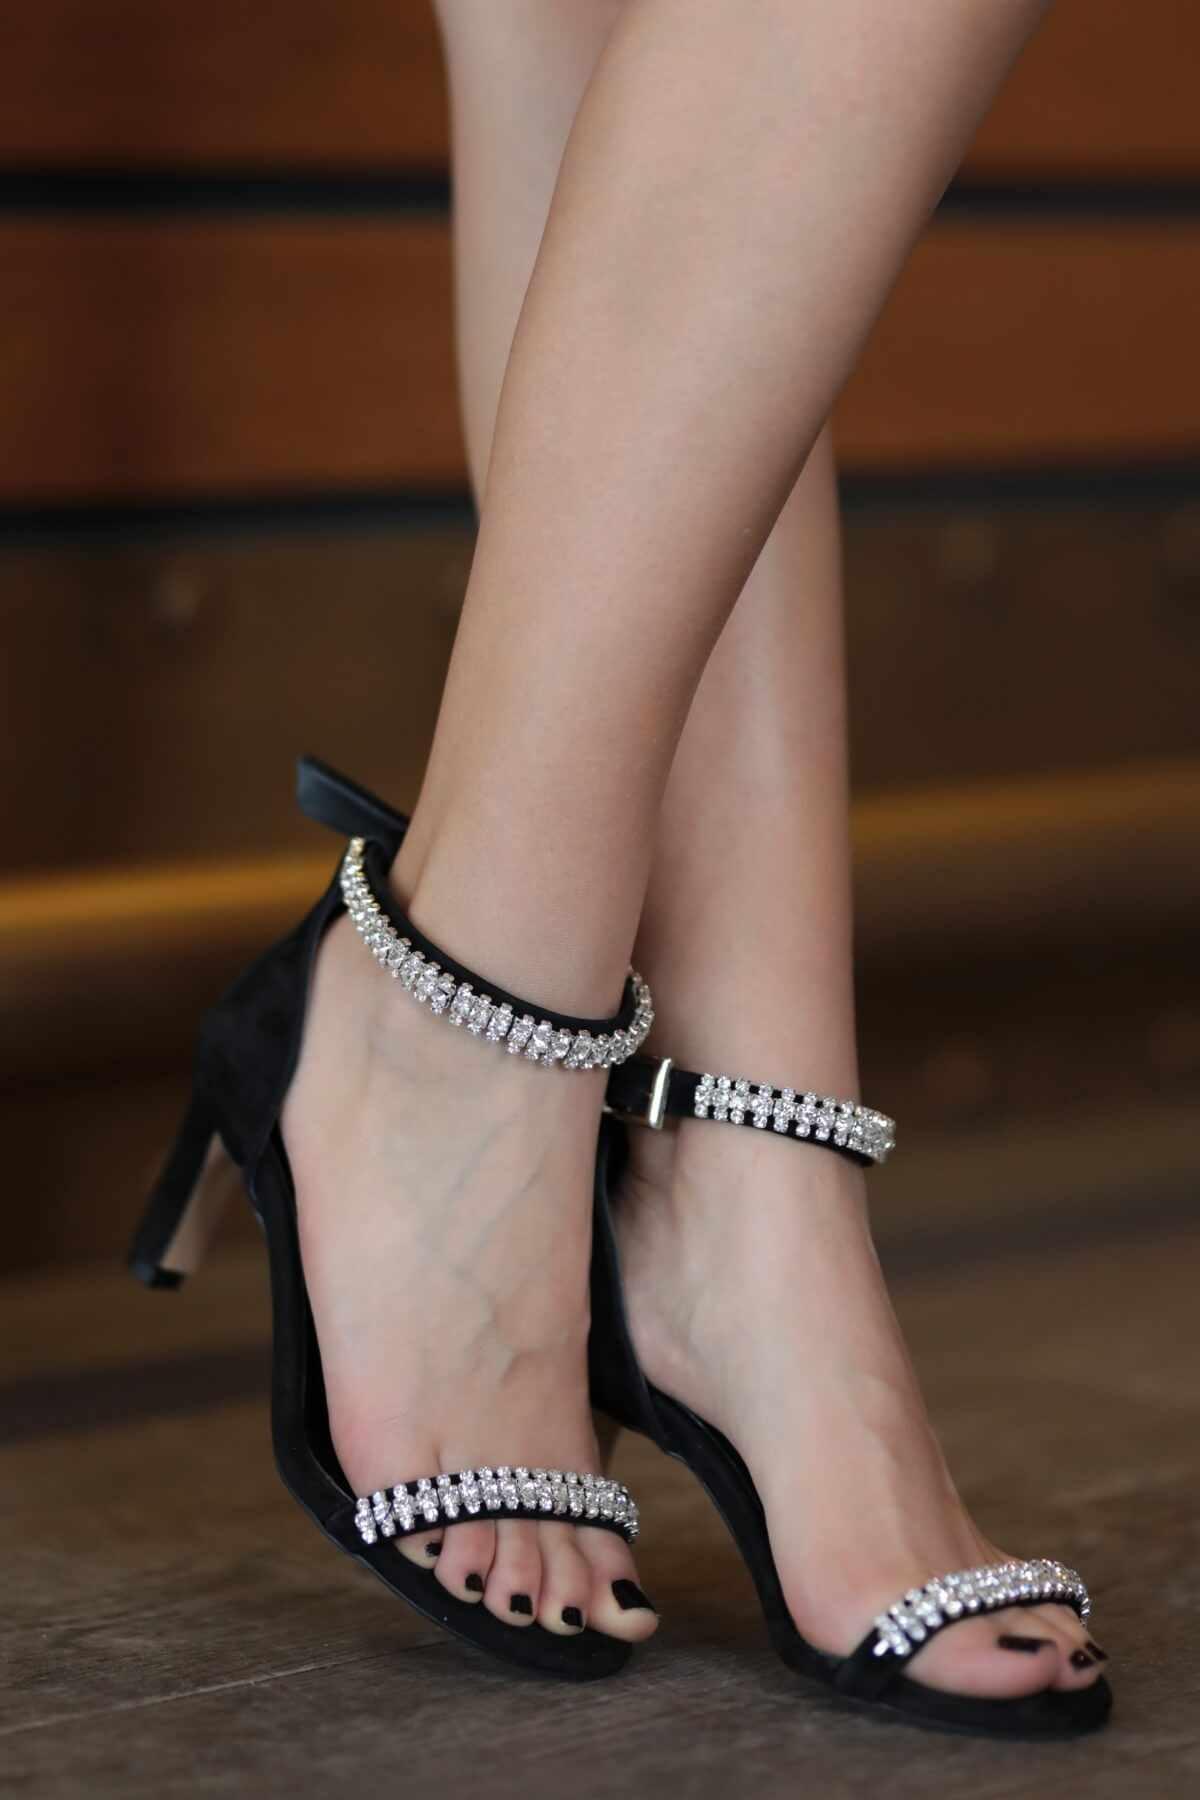 Hakiki Deri Paris Siyah Kısa Topuklu Abiye Ayakkabı Women Pump High Heels Shoes Female Summer Genuine Leather Wedding Party